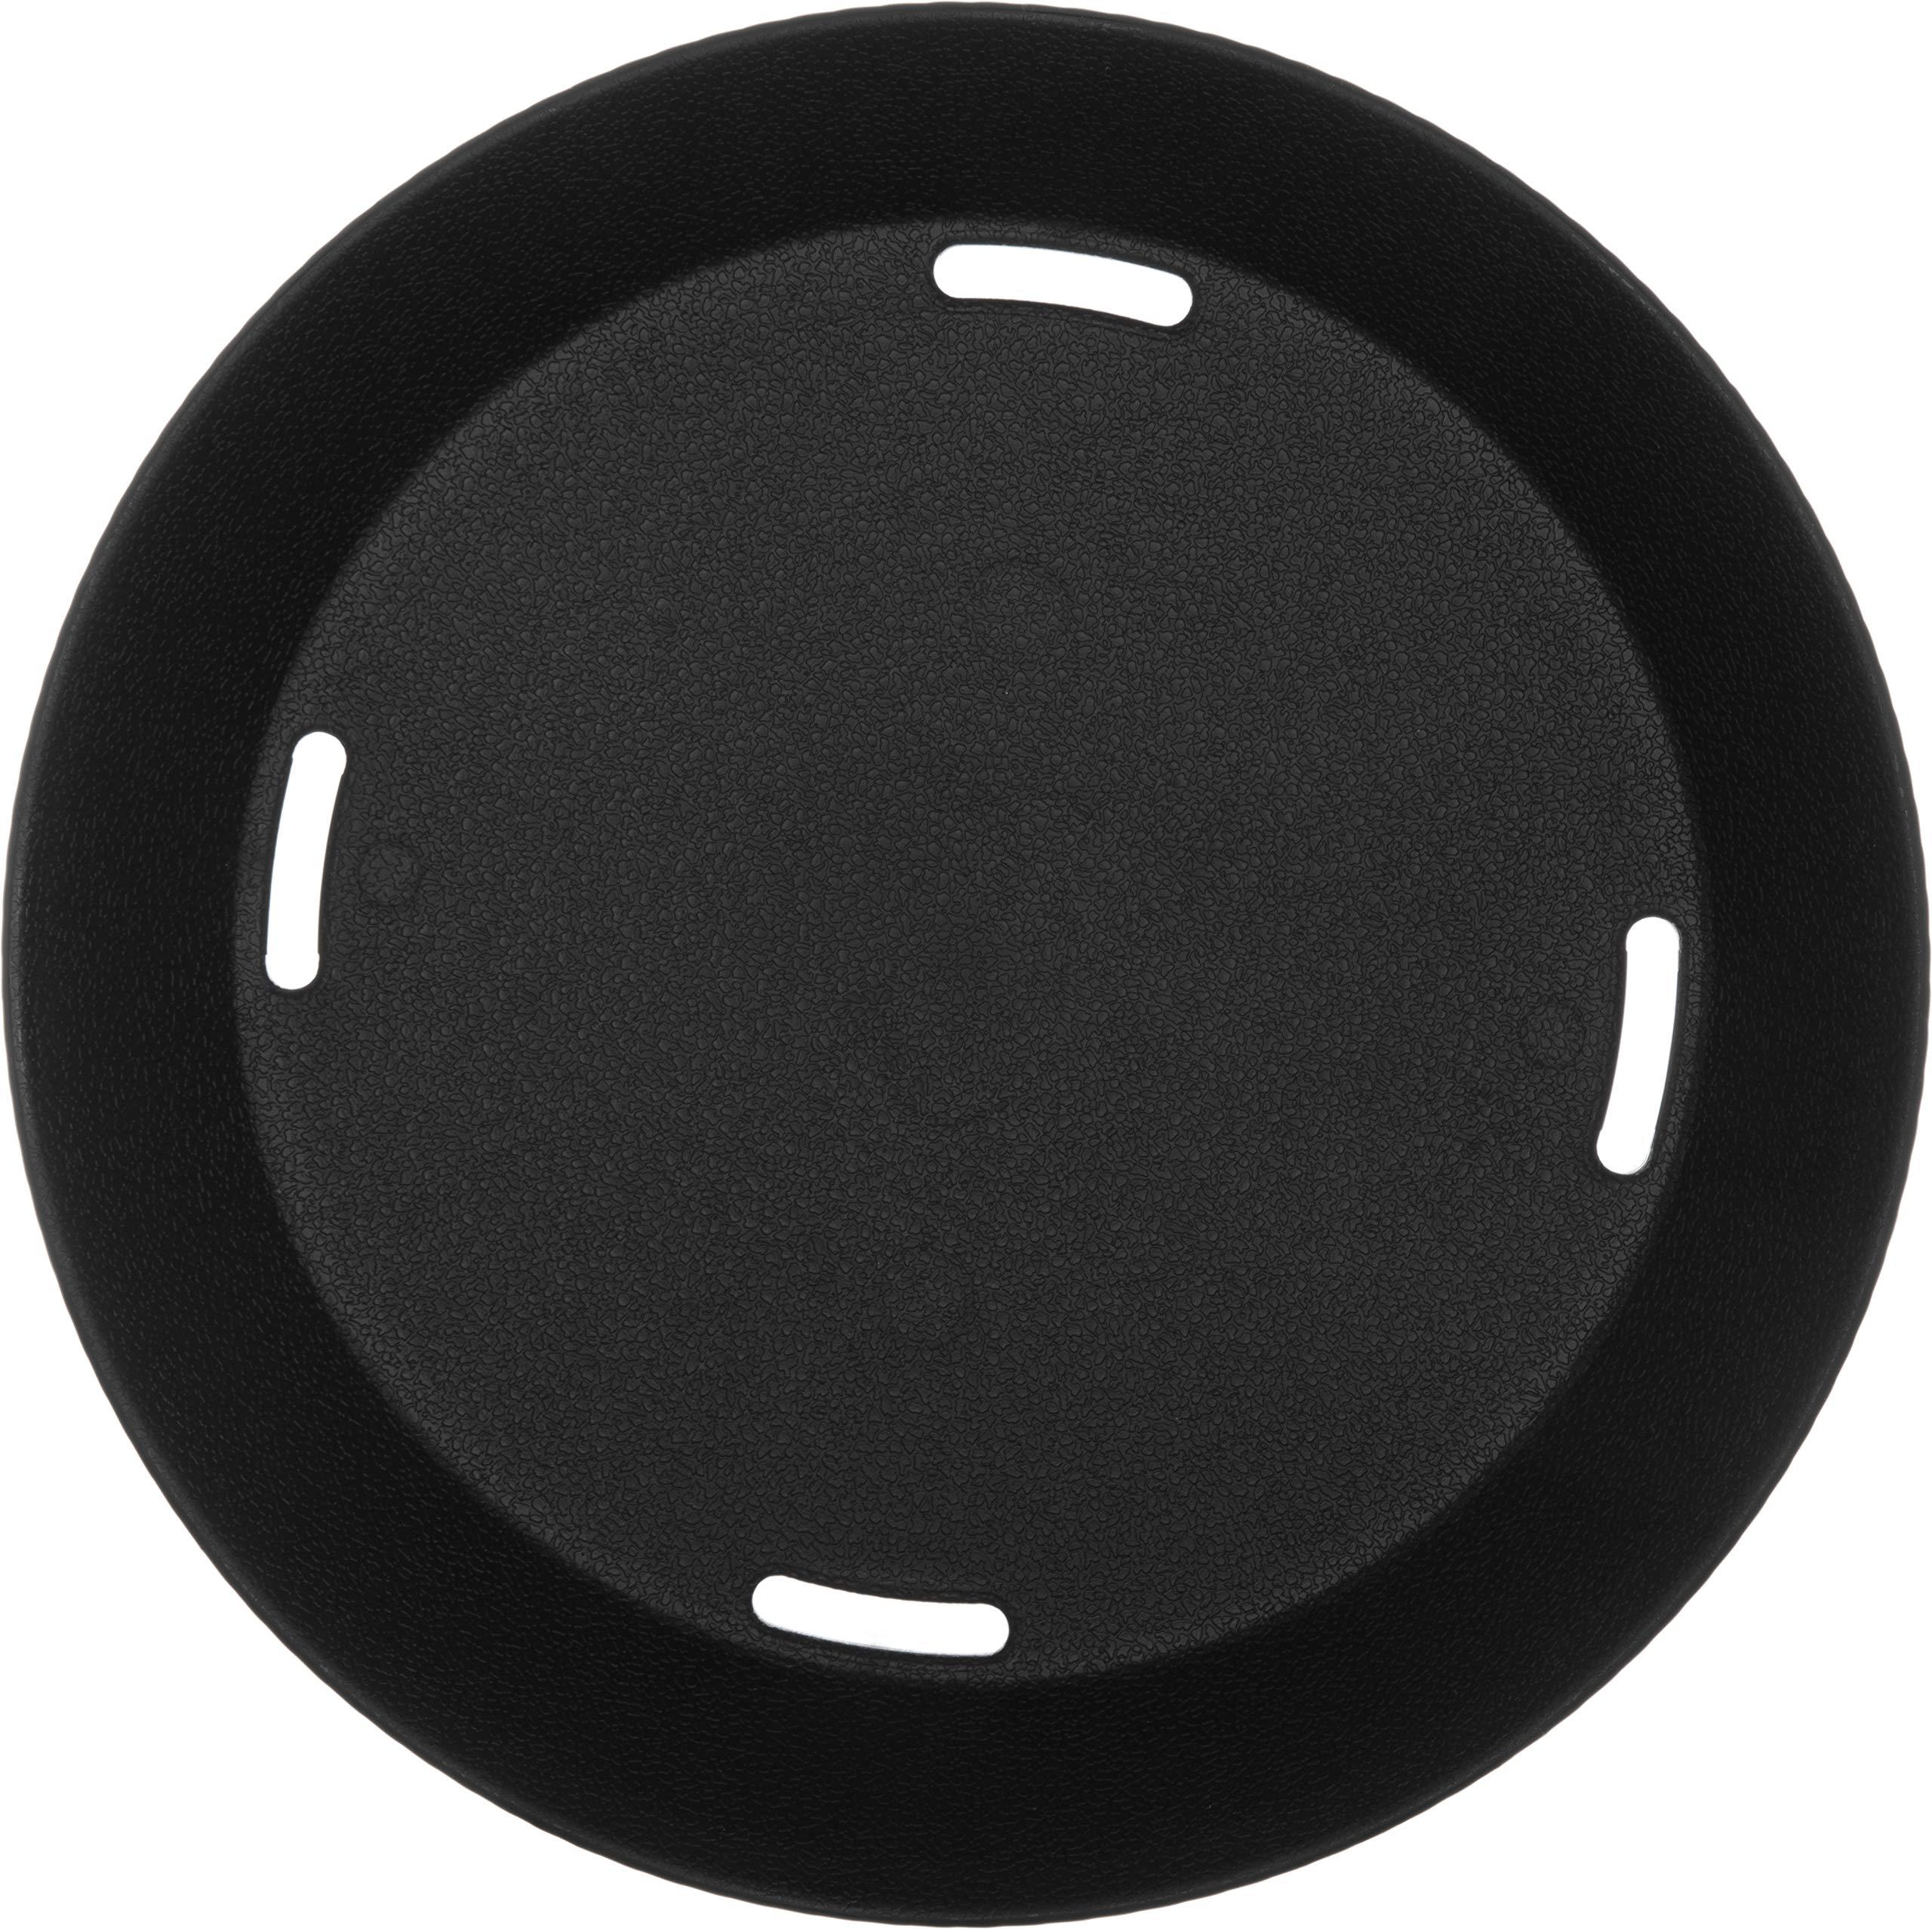 Carlisle 652803 WeaveWear Round Serving Basket, 9'', Black (Pack of 12) by Carlisle (Image #4)